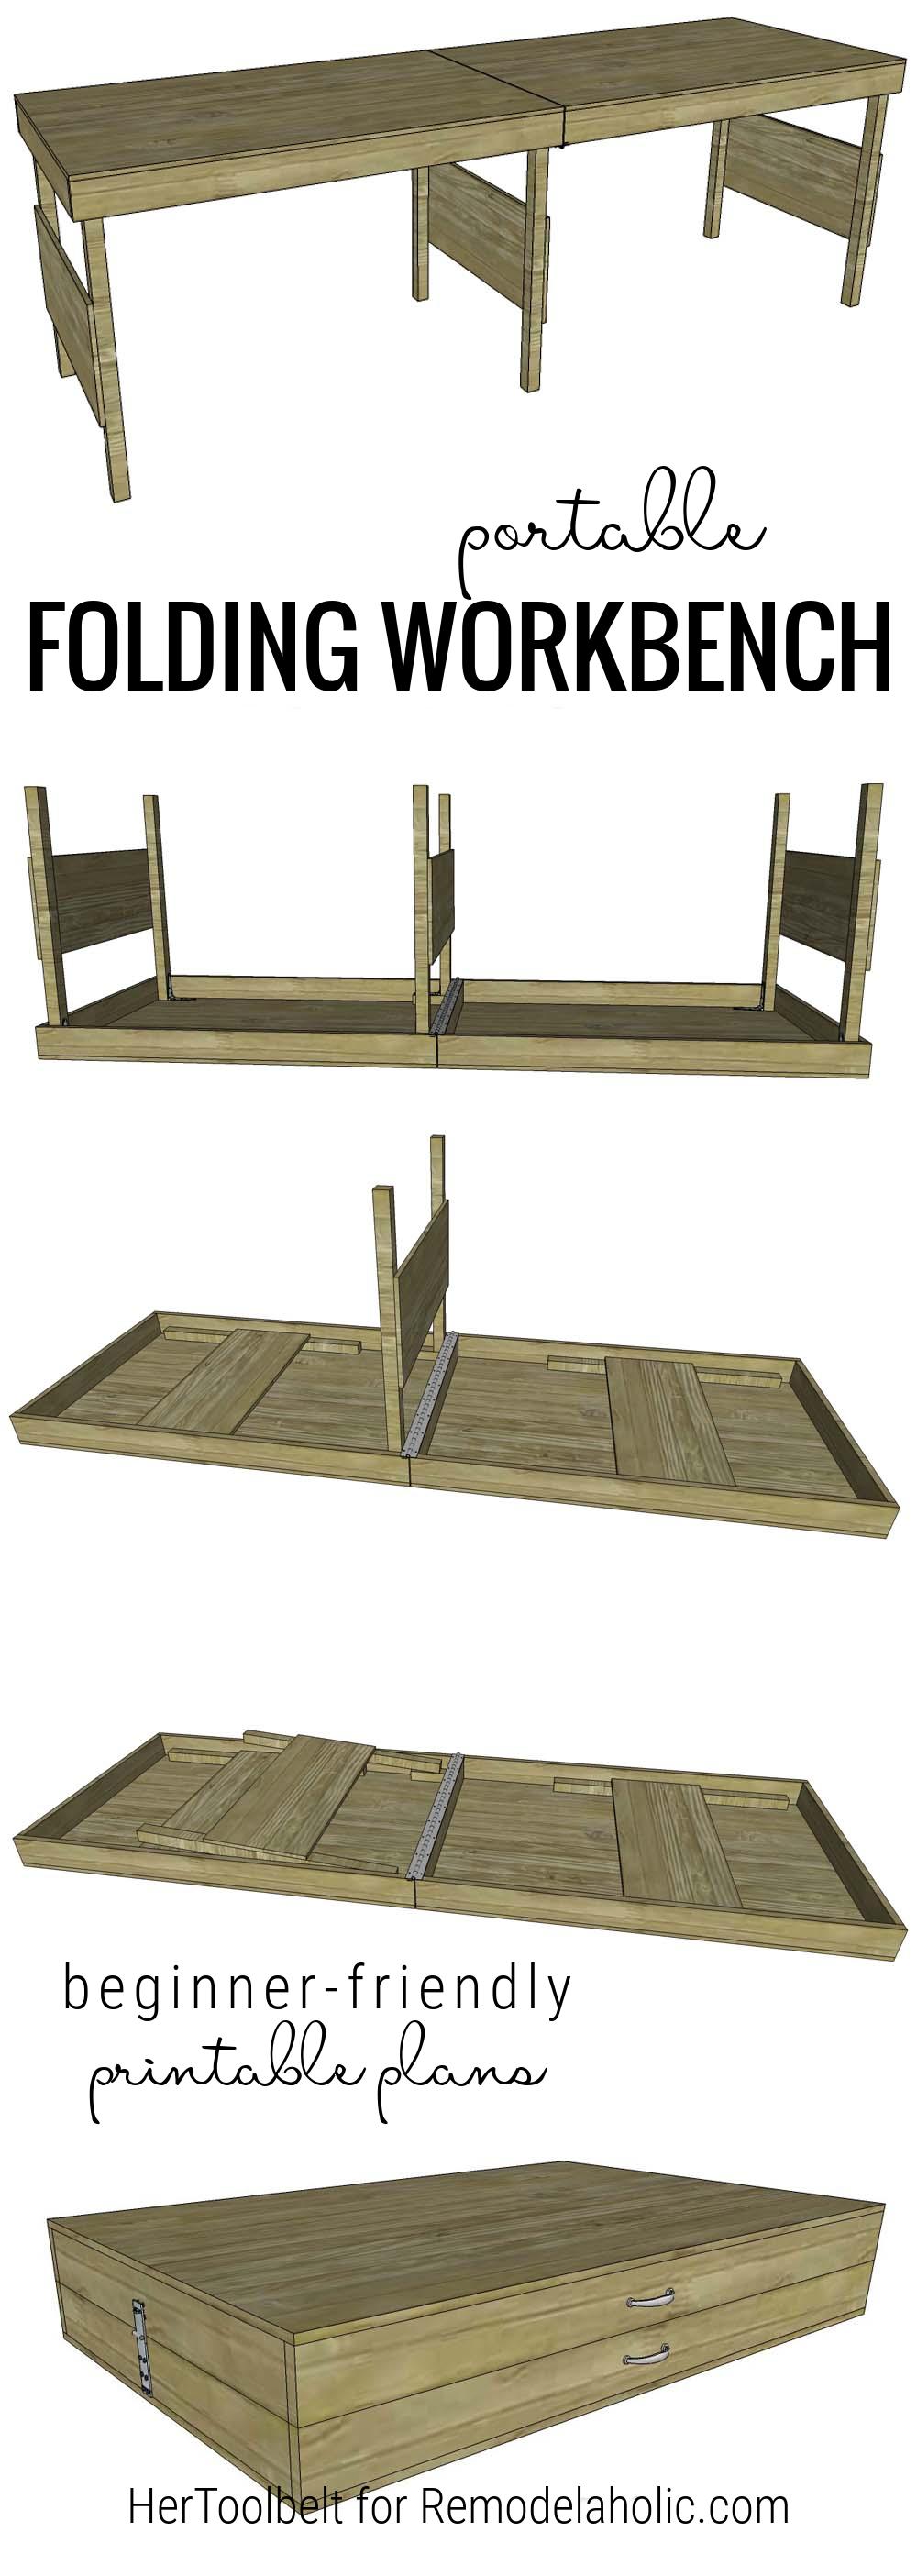 Diy Portable Folding Workbench Plans, Beginner Friendly, One Sheet Of Plywood, Remodelaholic